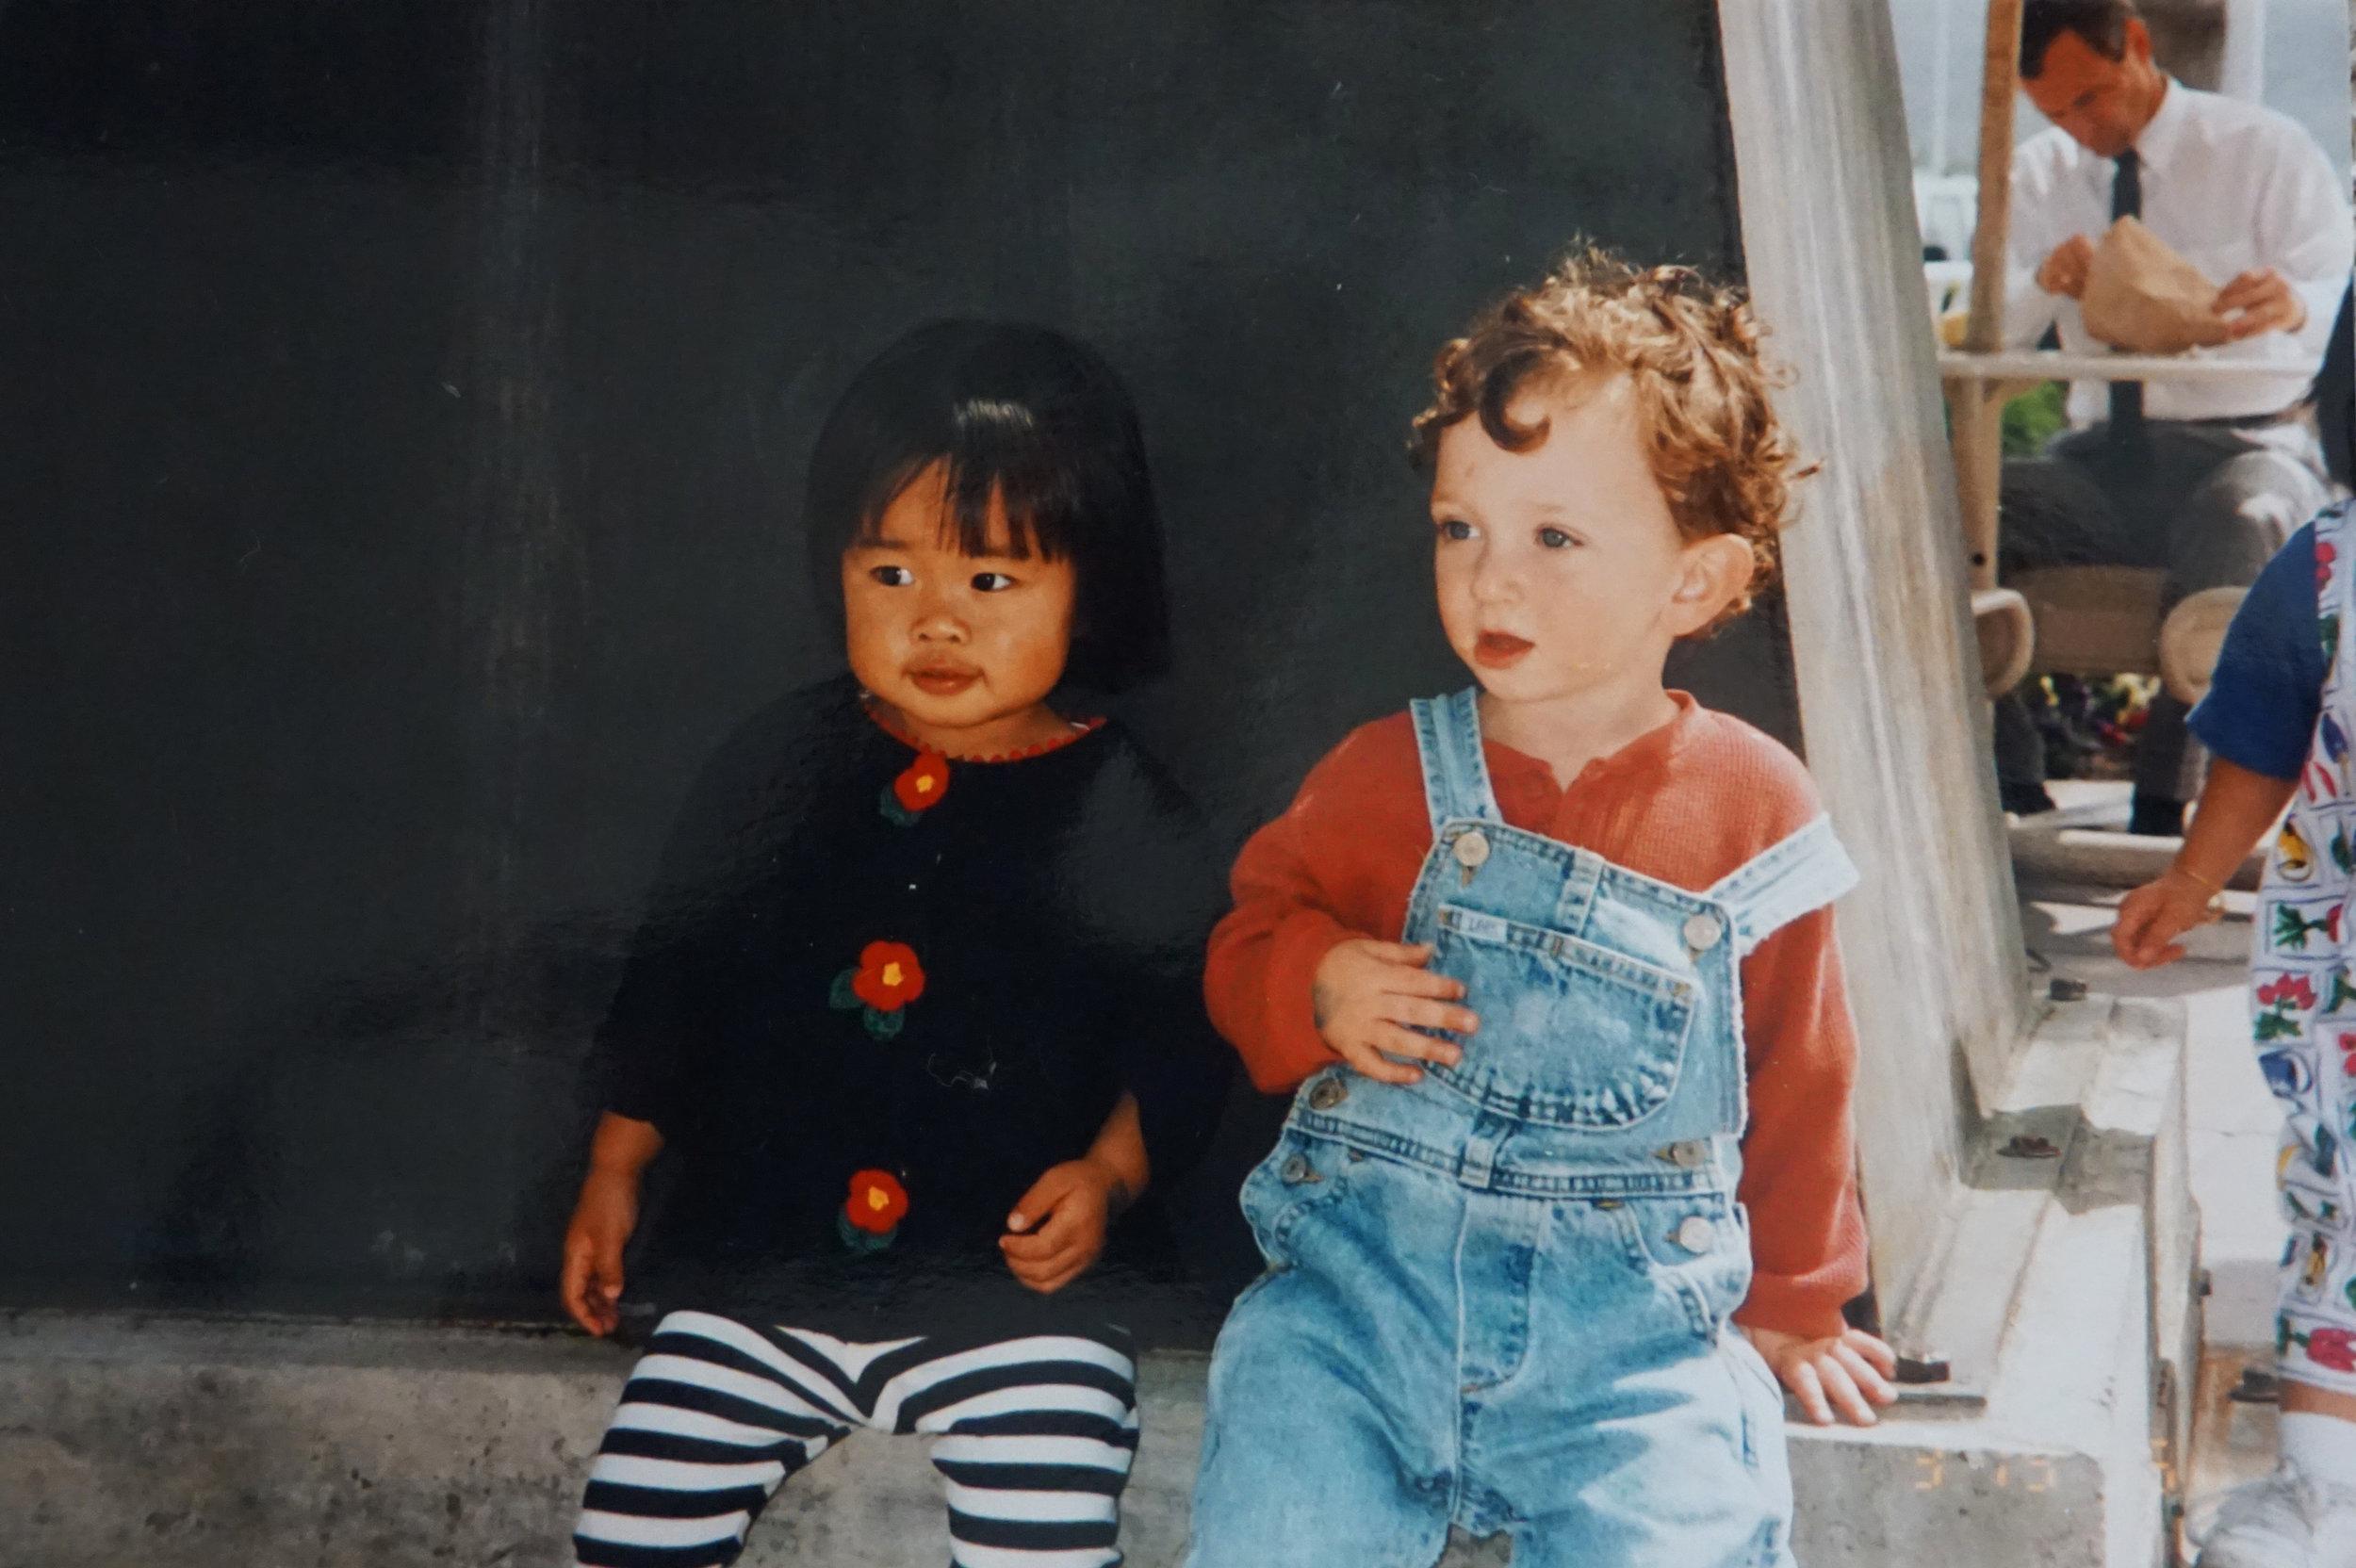 Me and Josh, 1995